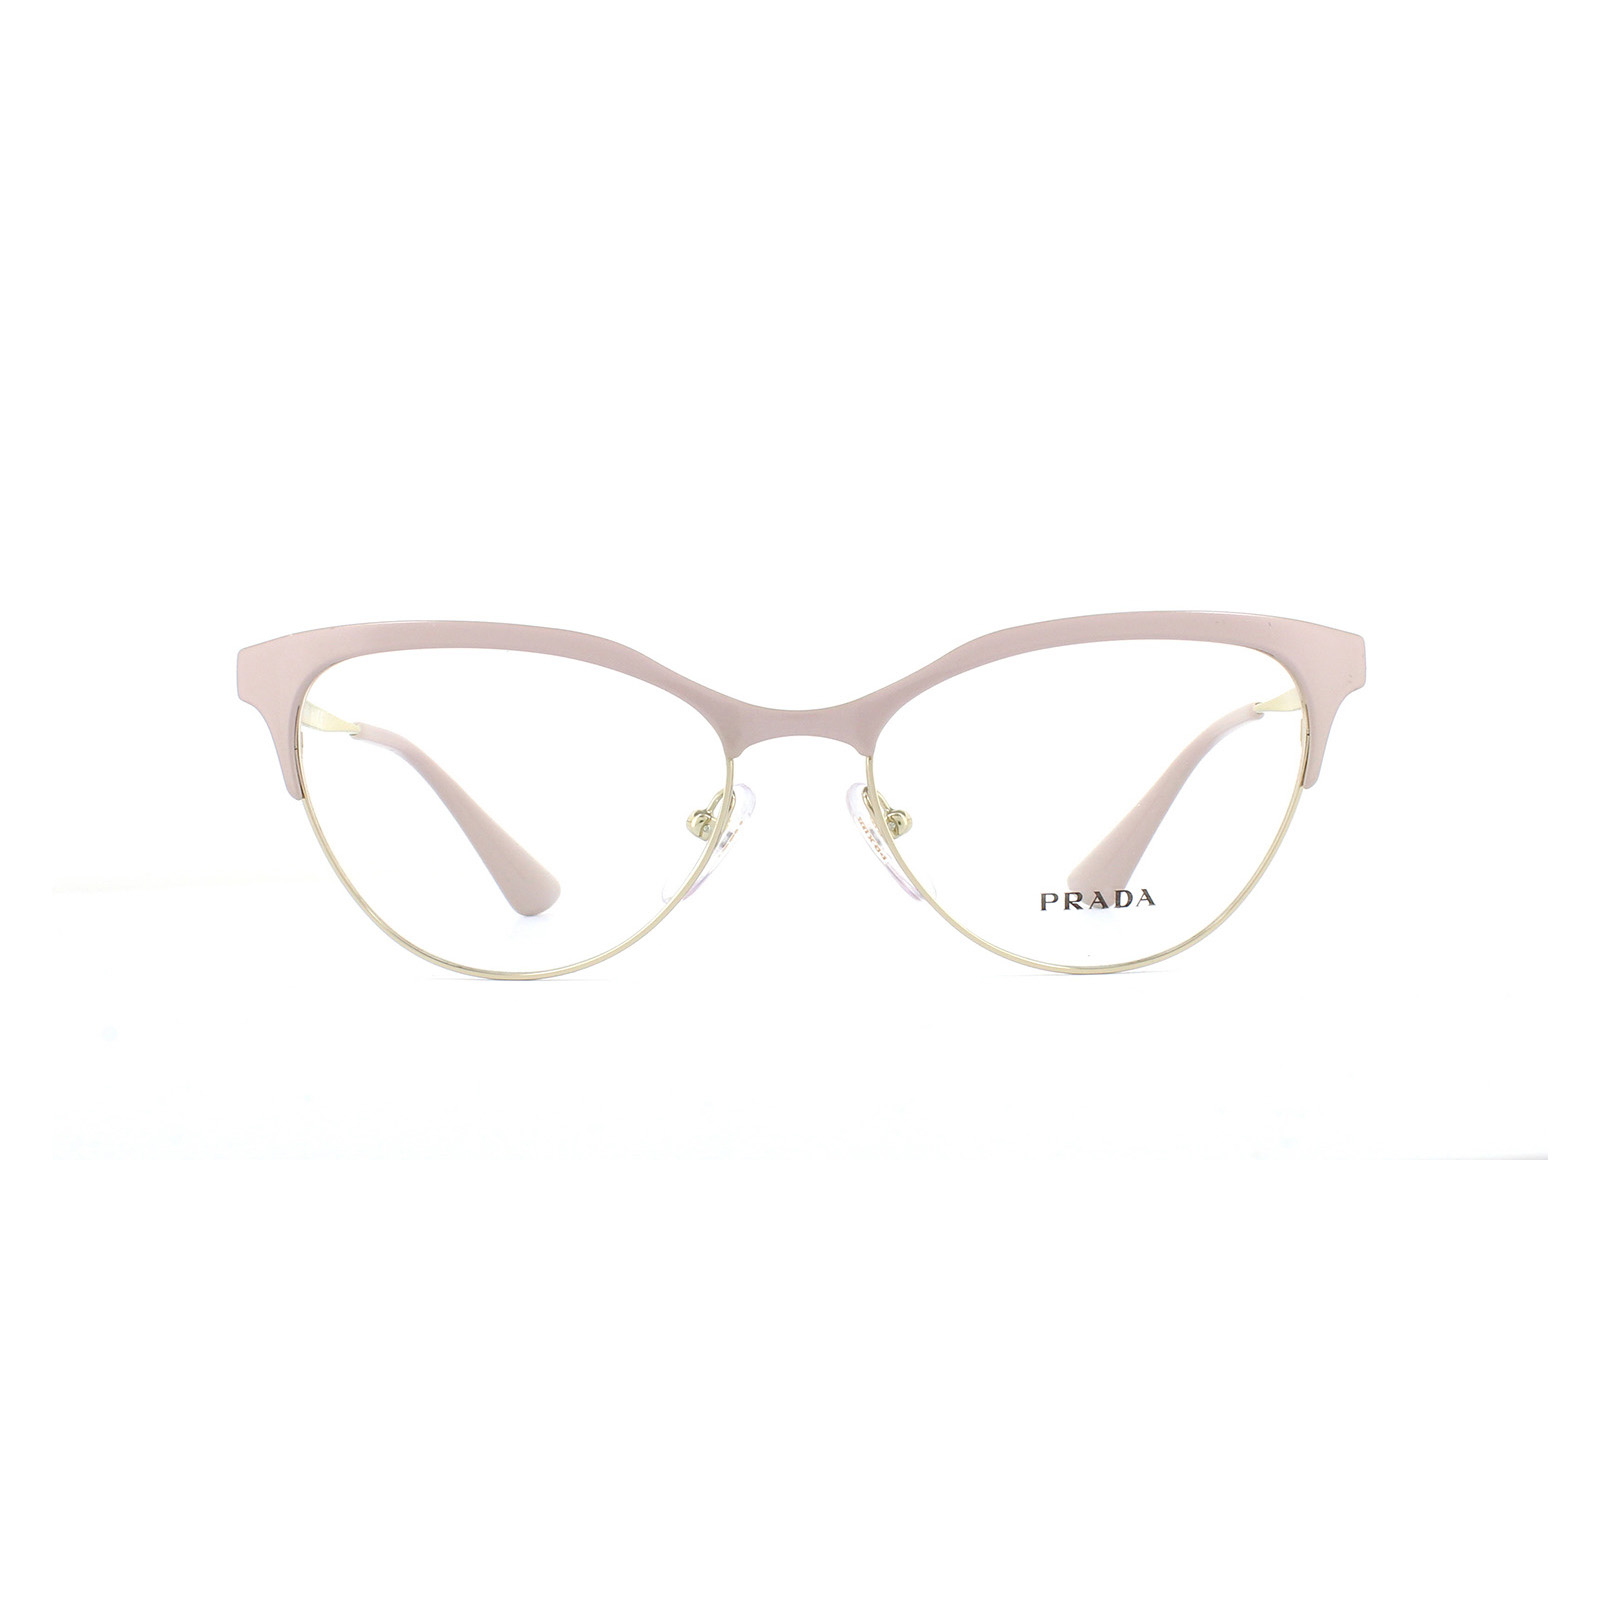 ba4fe65a82b ... reduced hot prada sunglasses pink frame sentinel prada glasses frames  55sv uf51o1 pink pale gold womens